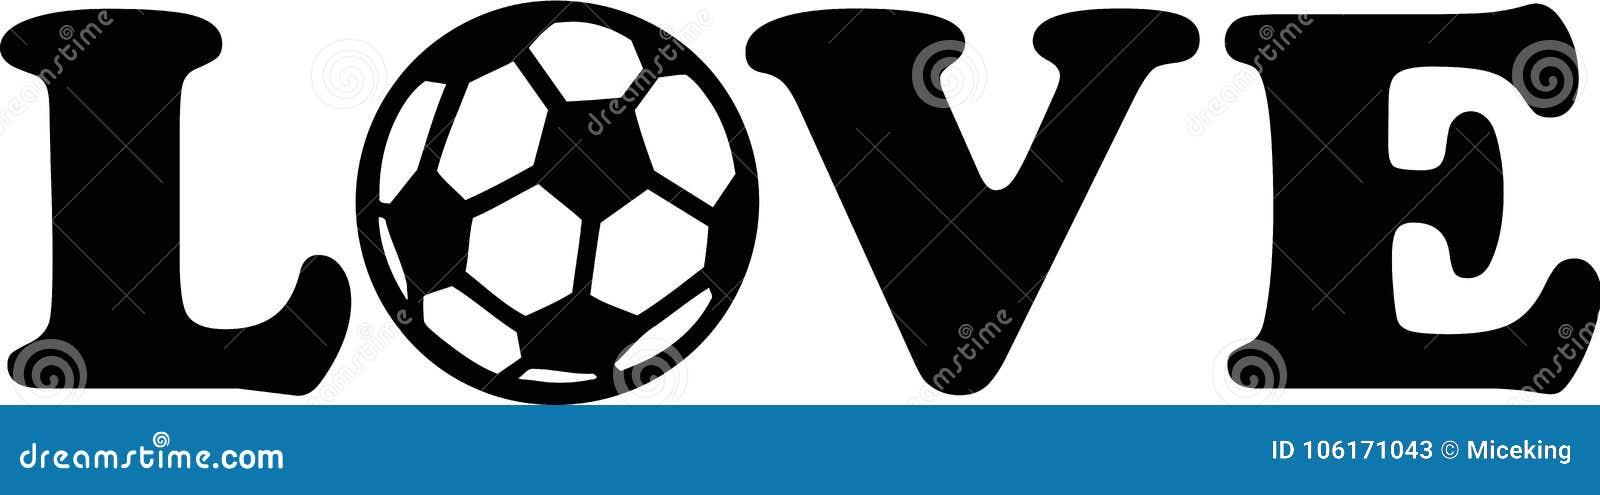 Download Soccer Football Love stock vector. Illustration of logo ...